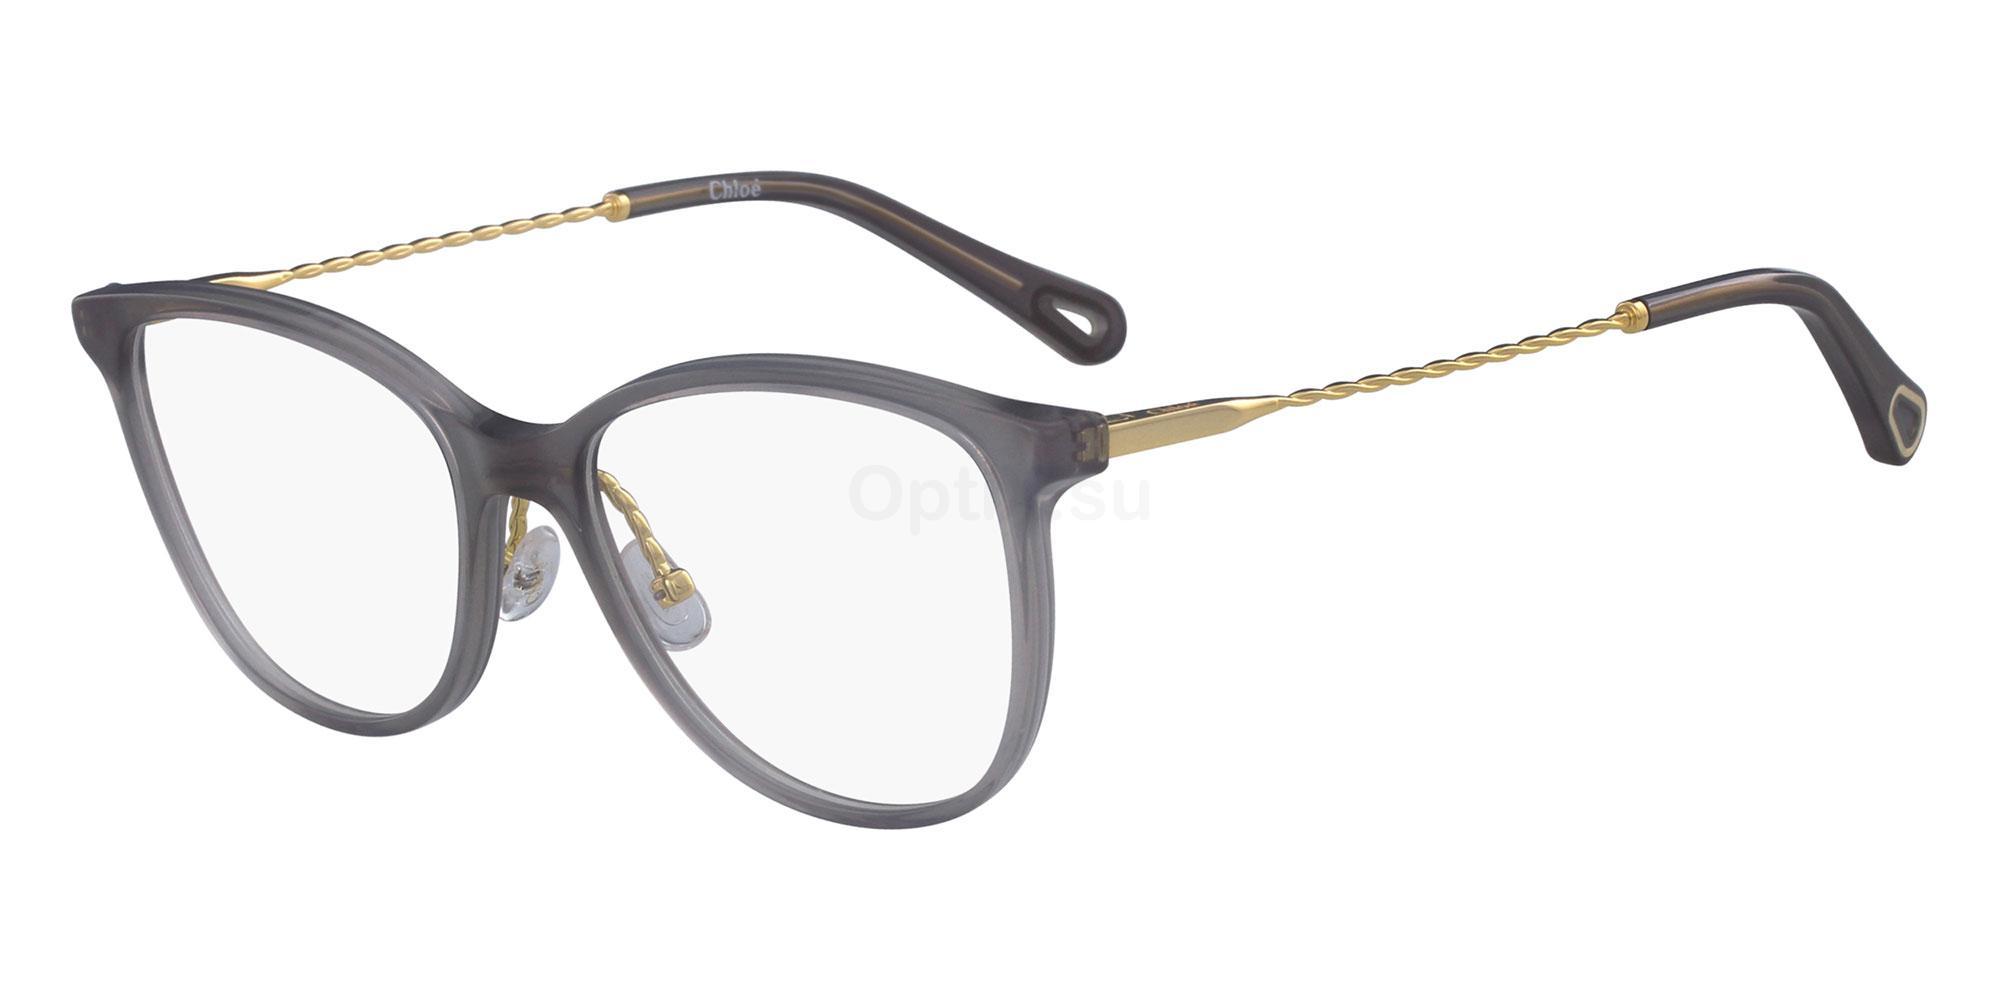 035 CE2727 Glasses, Chloe